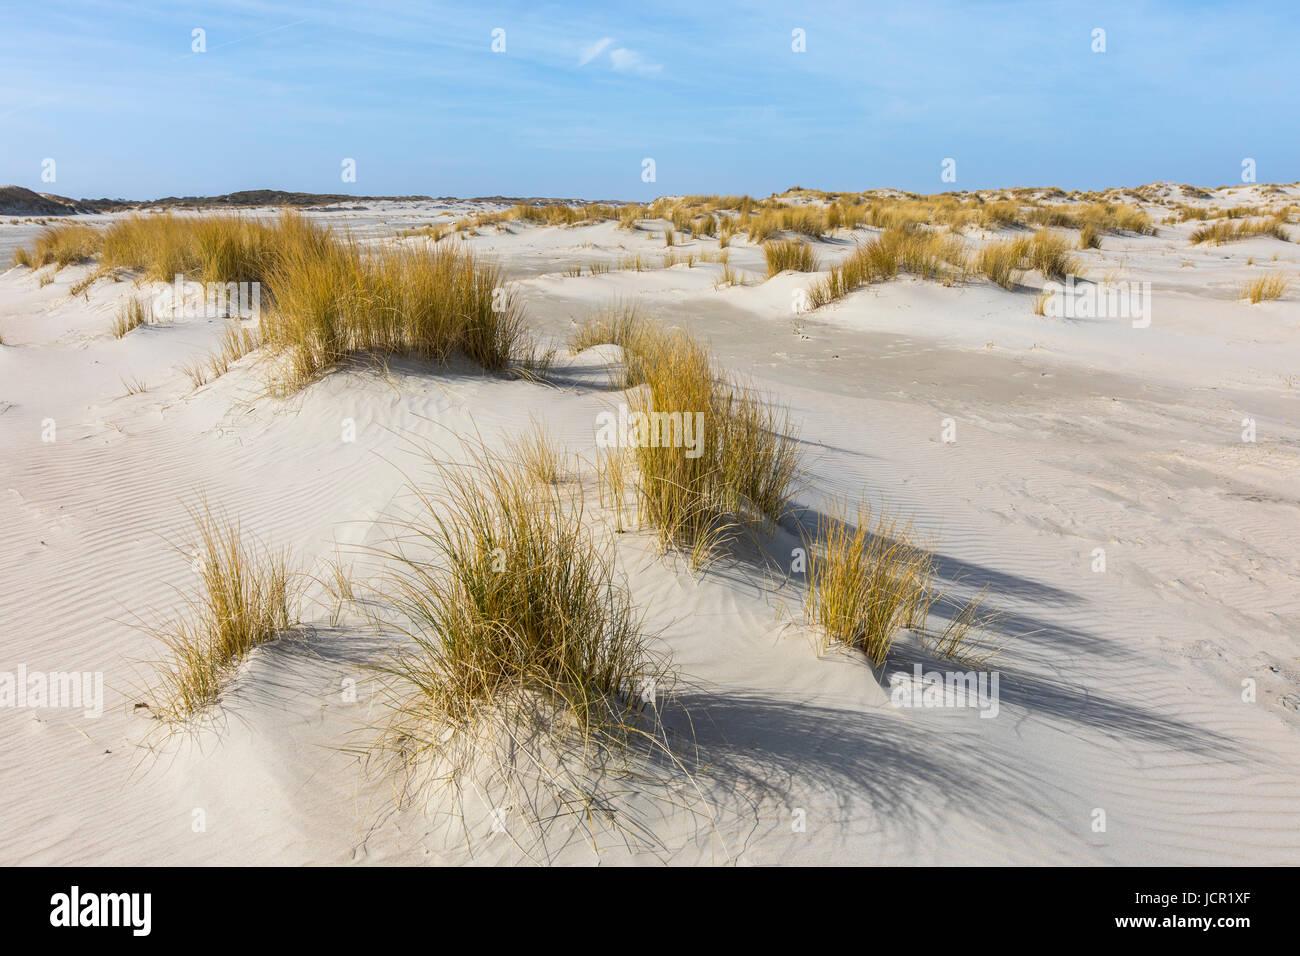 North Sea island, Norderney, East Frisia, Germany, Beach, Stock Photo